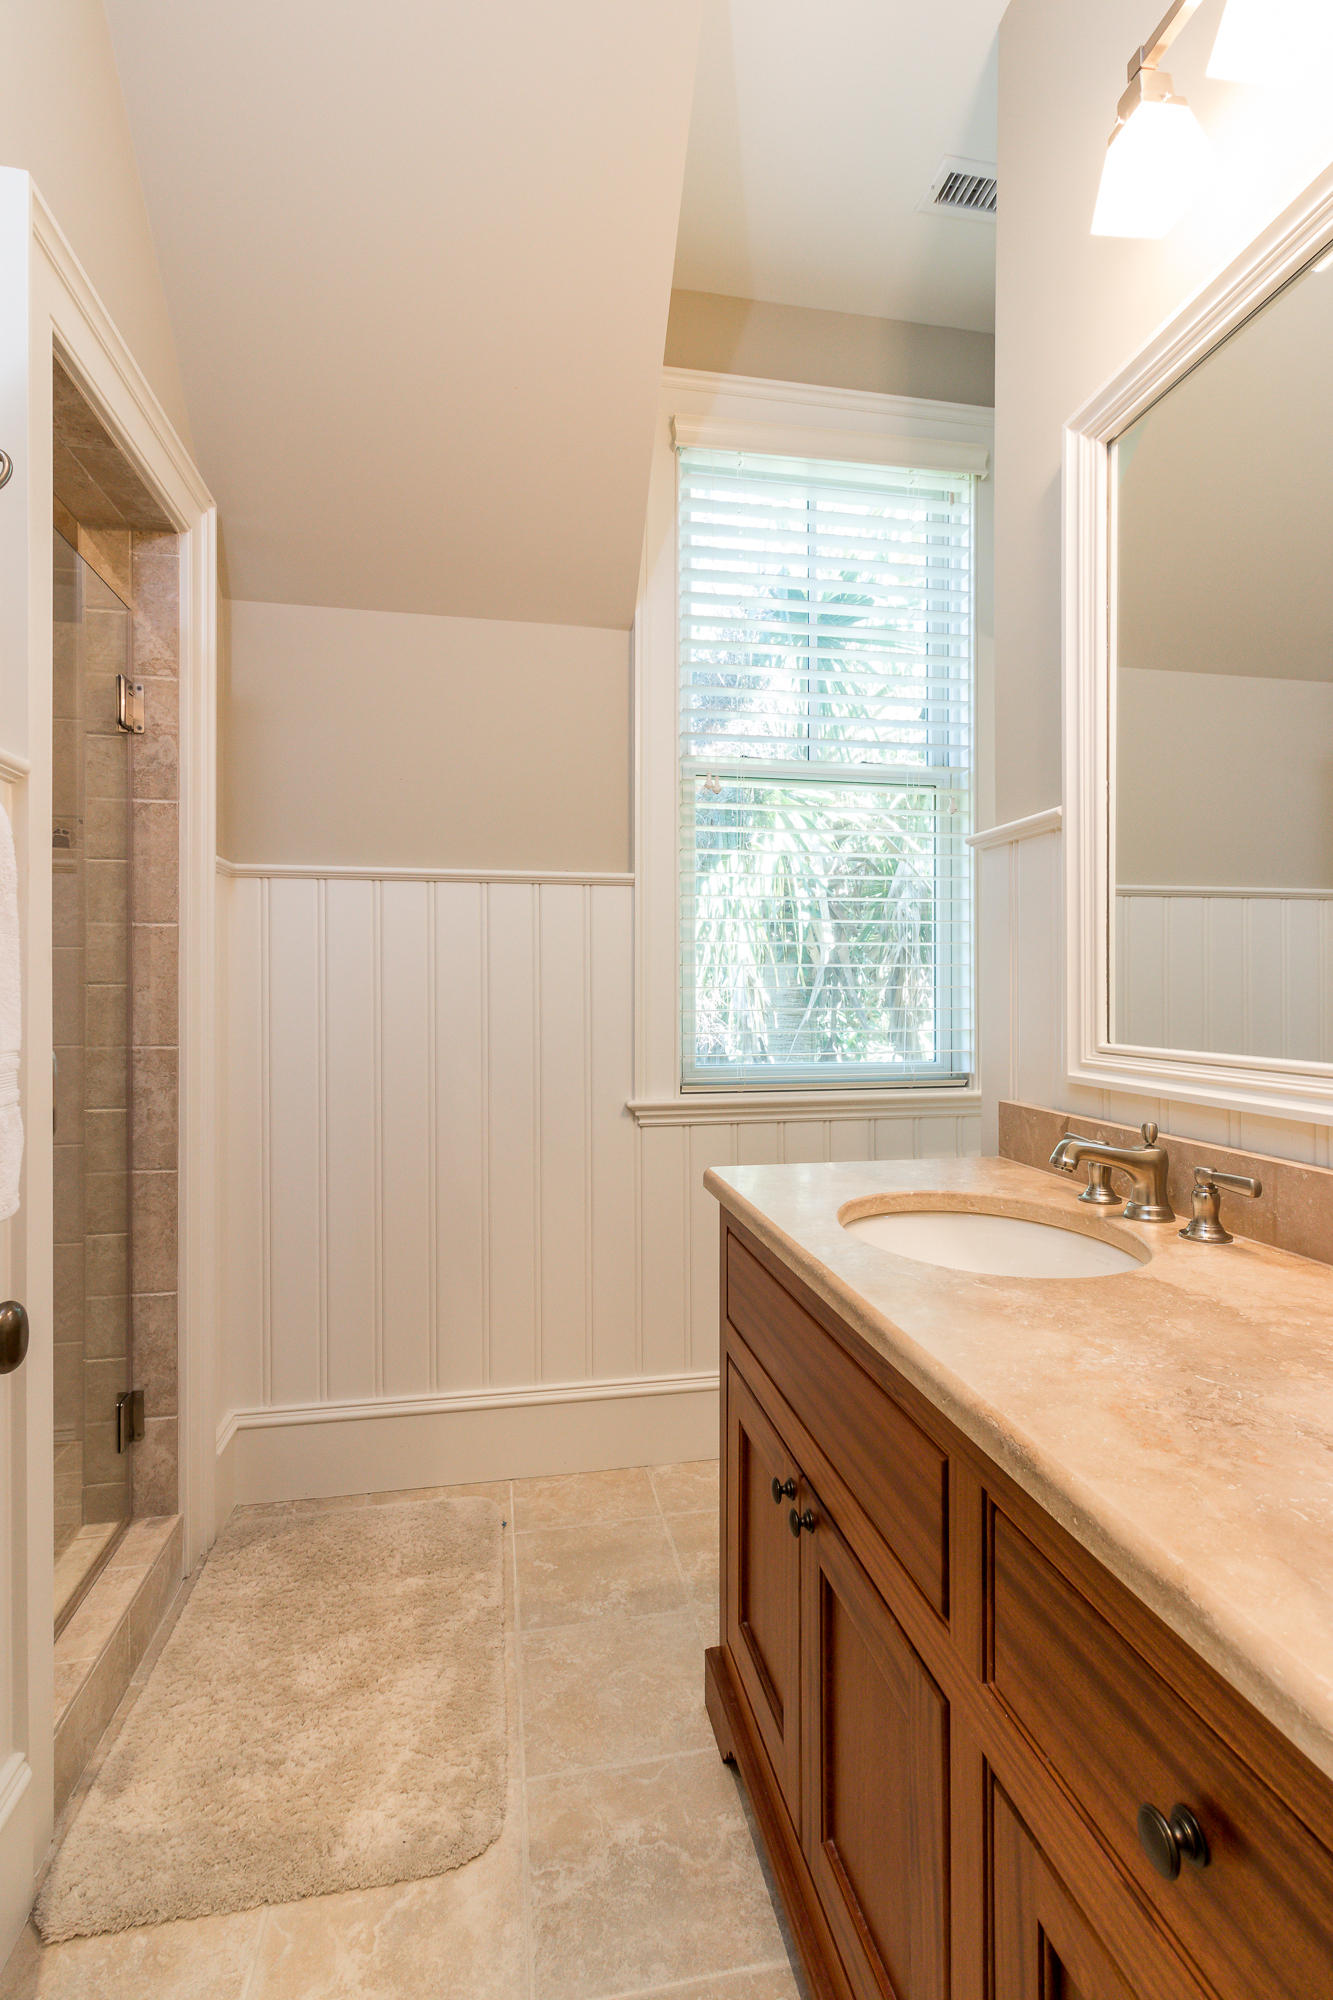 Egret/Pintail Homes For Sale - 117 Bufflehead, Kiawah Island, SC - 18